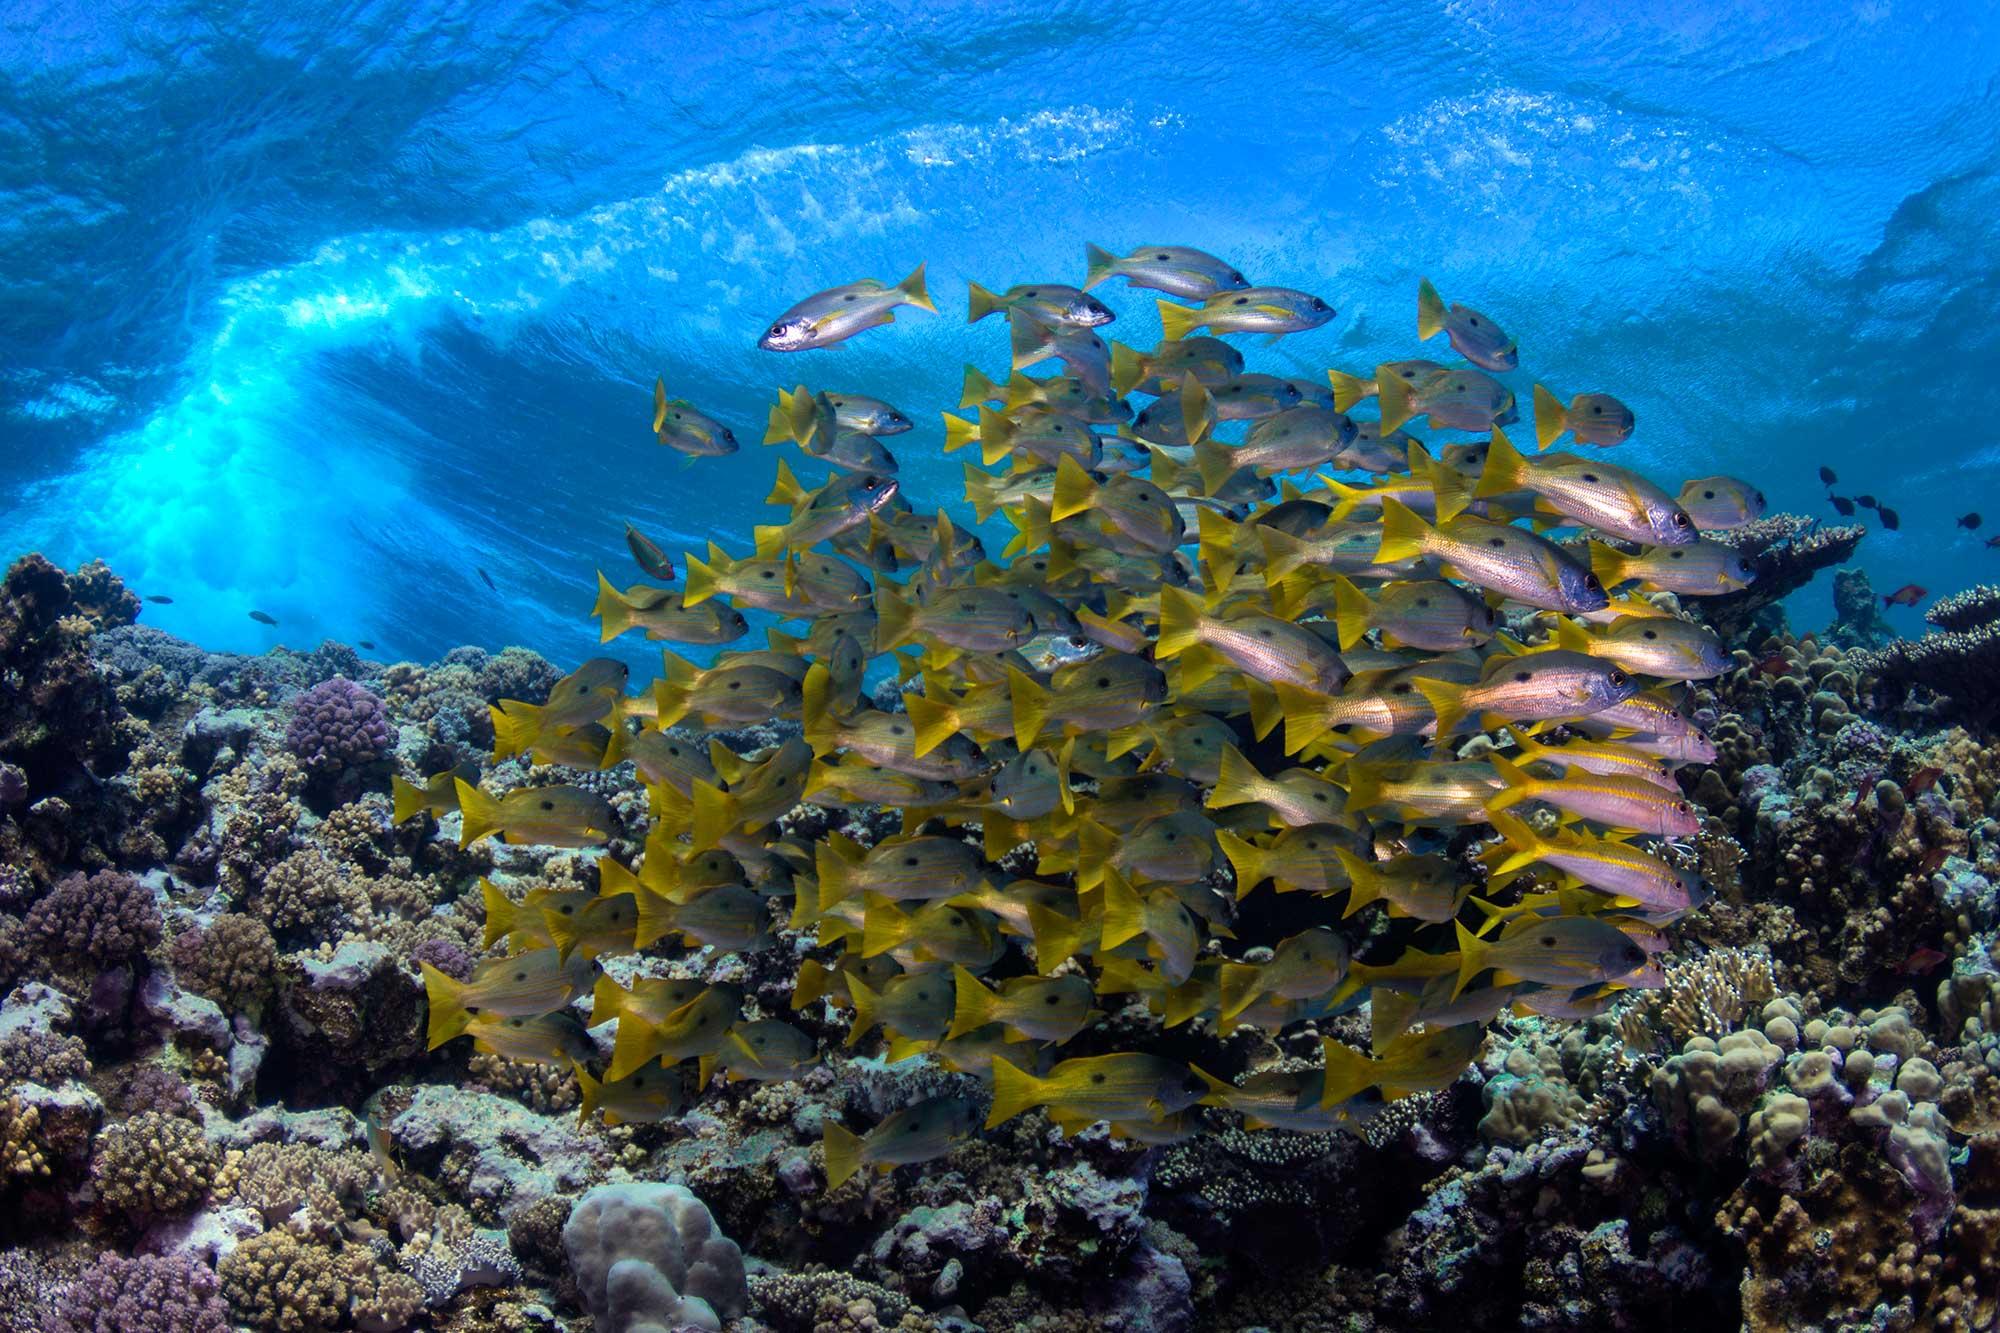 Marsa Shagra Reef, southern Red Sea, Egypt